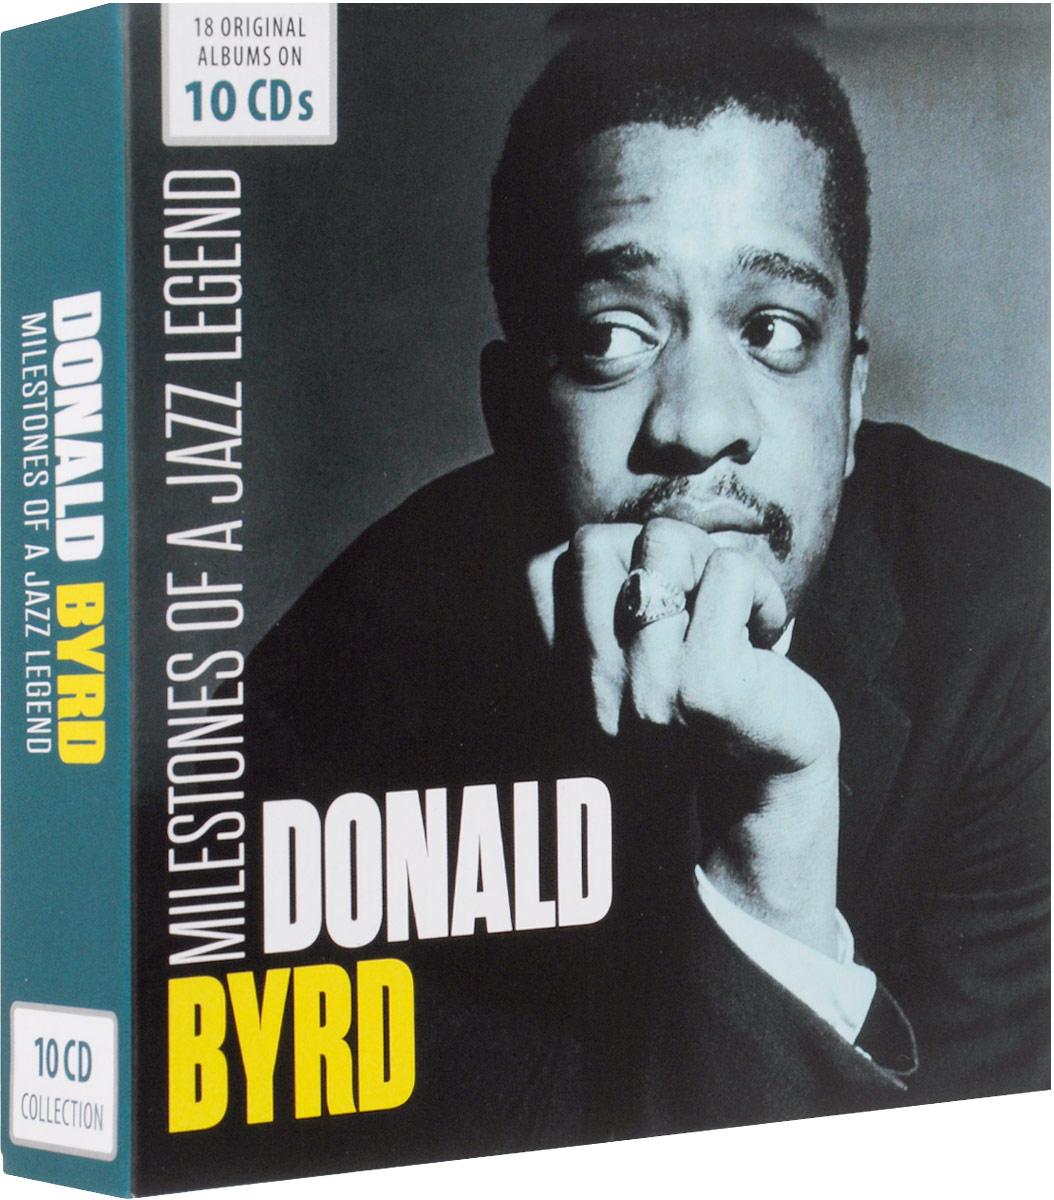 все цены на Дональд Берд Donald Byrd. Milestones Of A Jazz Legend (10 CD)